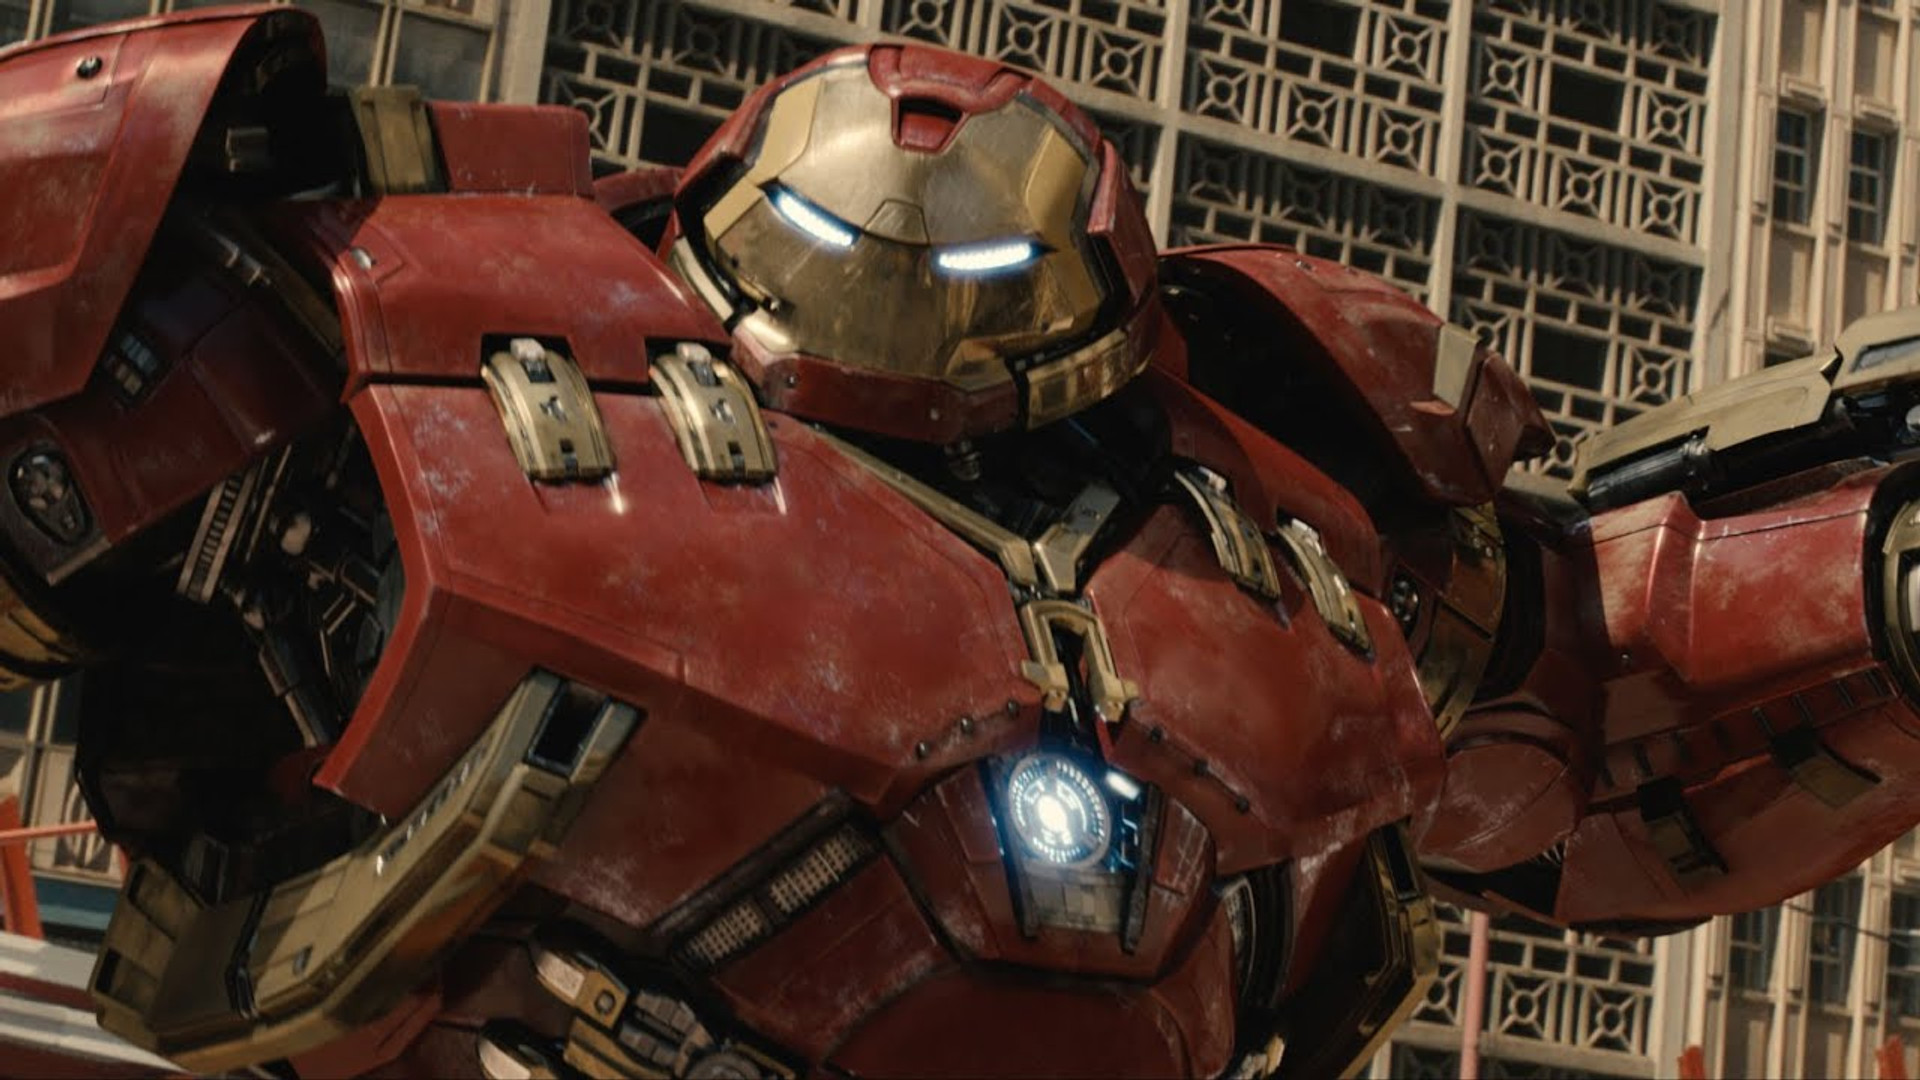 'AVENGERS: AGE OF ULTRON' | Marvel Studios